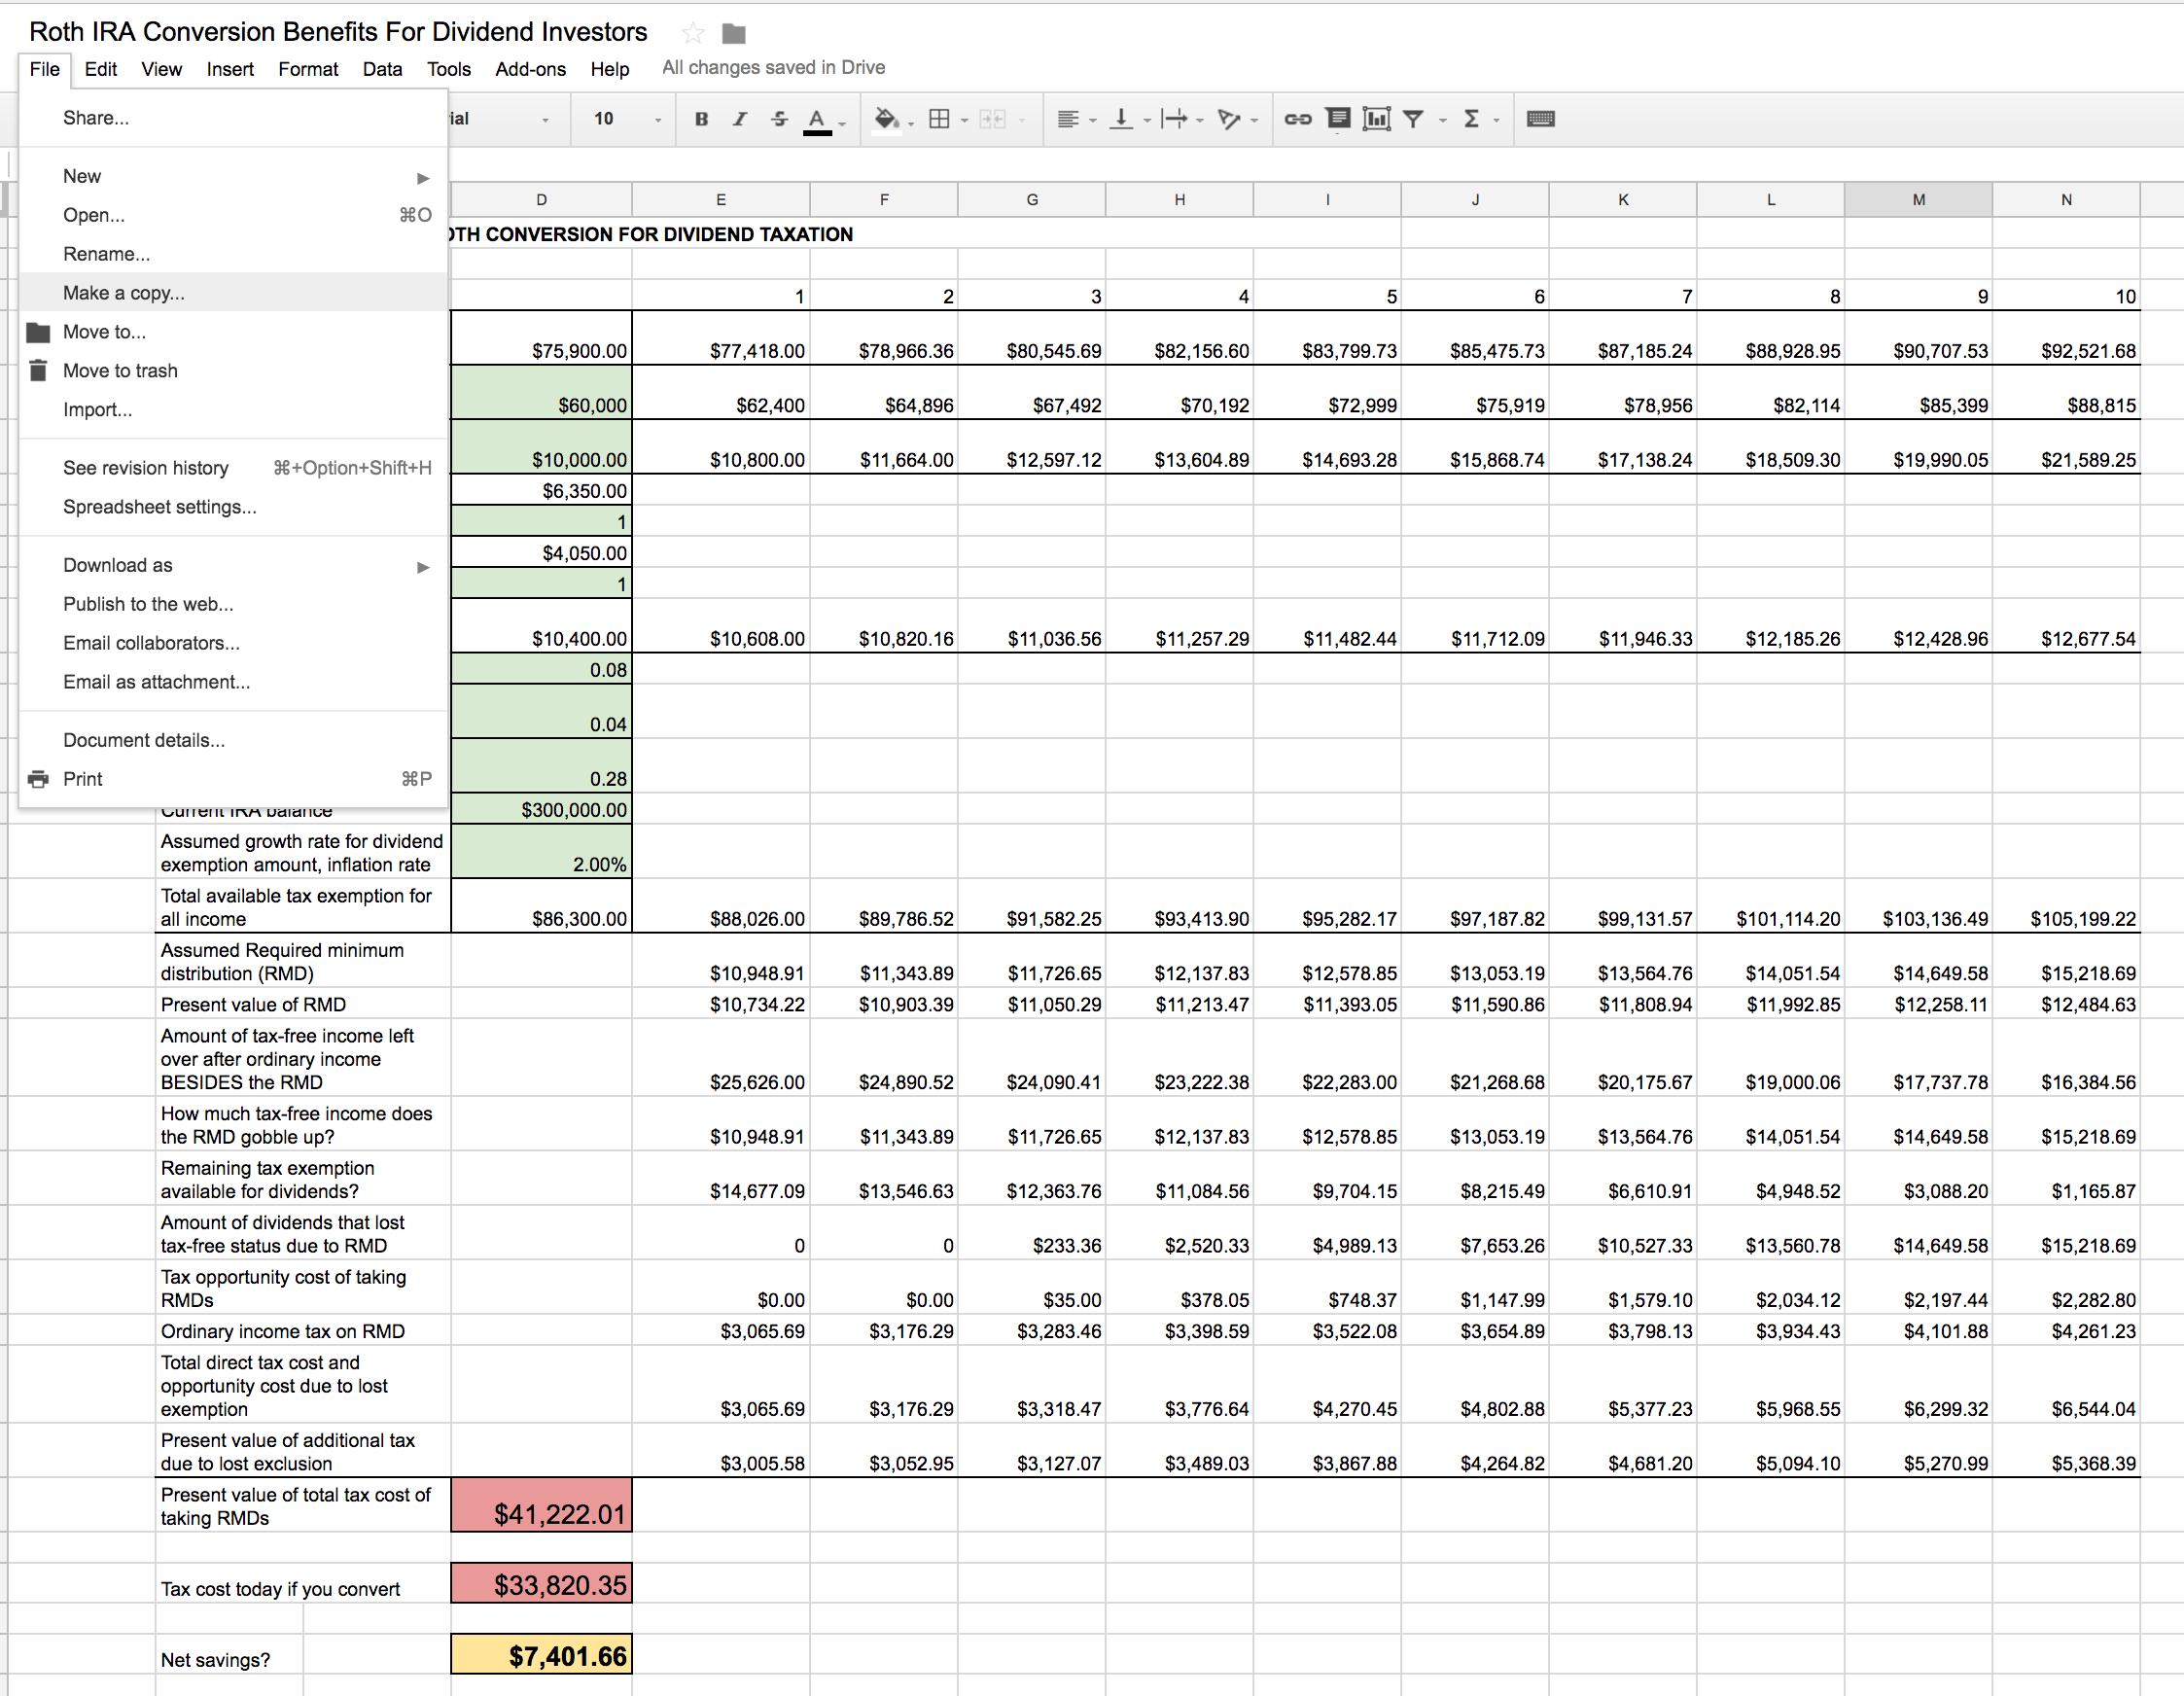 Roth Ira Conversion Spreadsheet  Seeking Alpha Or Funding 401Ks And Roth Iras Worksheet